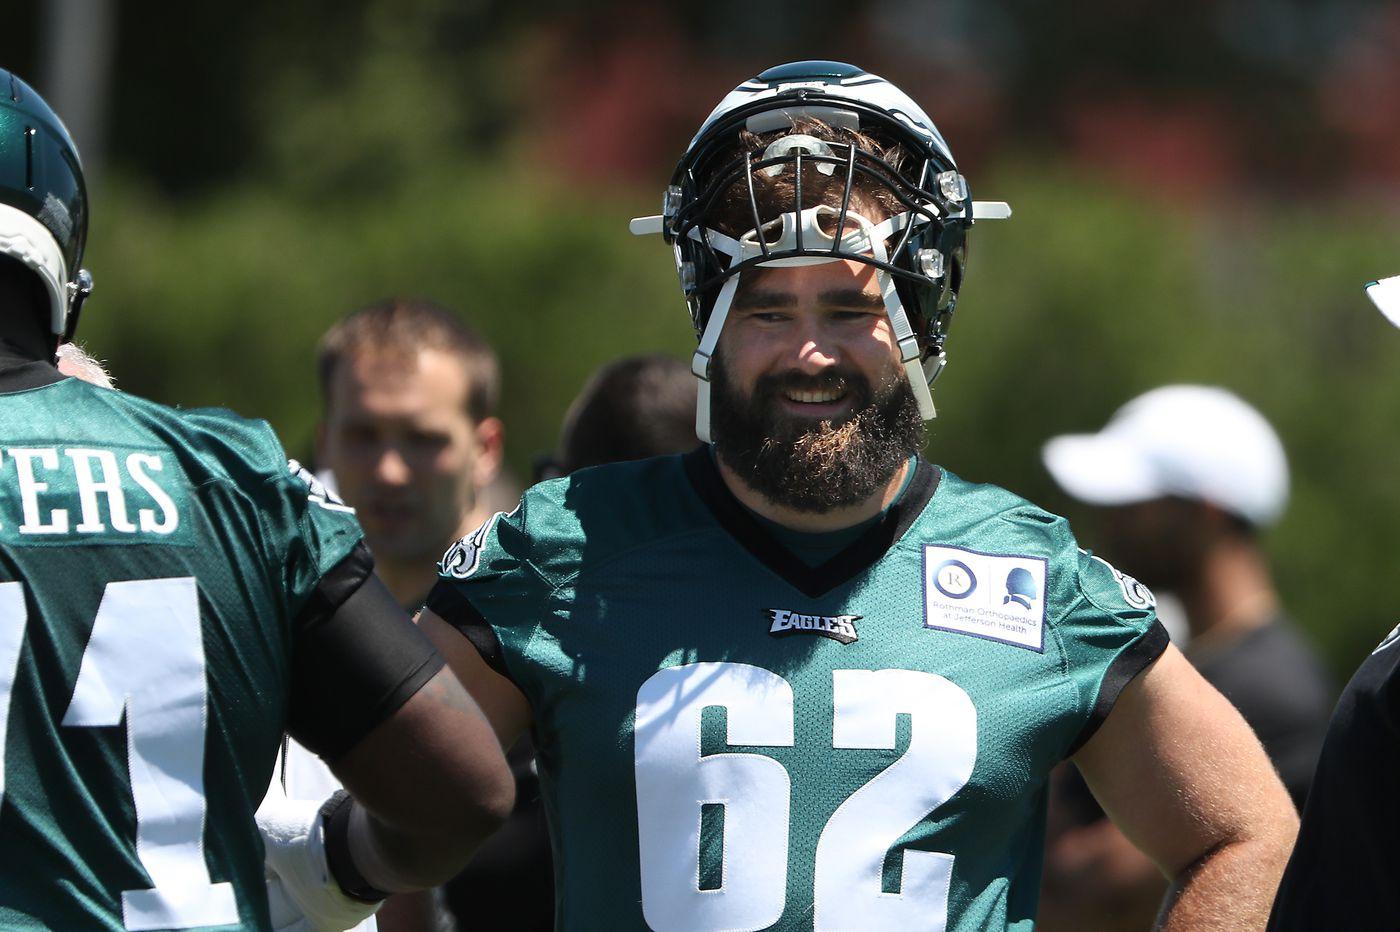 Eagles' Jason Kelce, king of Philadelphia, takes on new role: dad